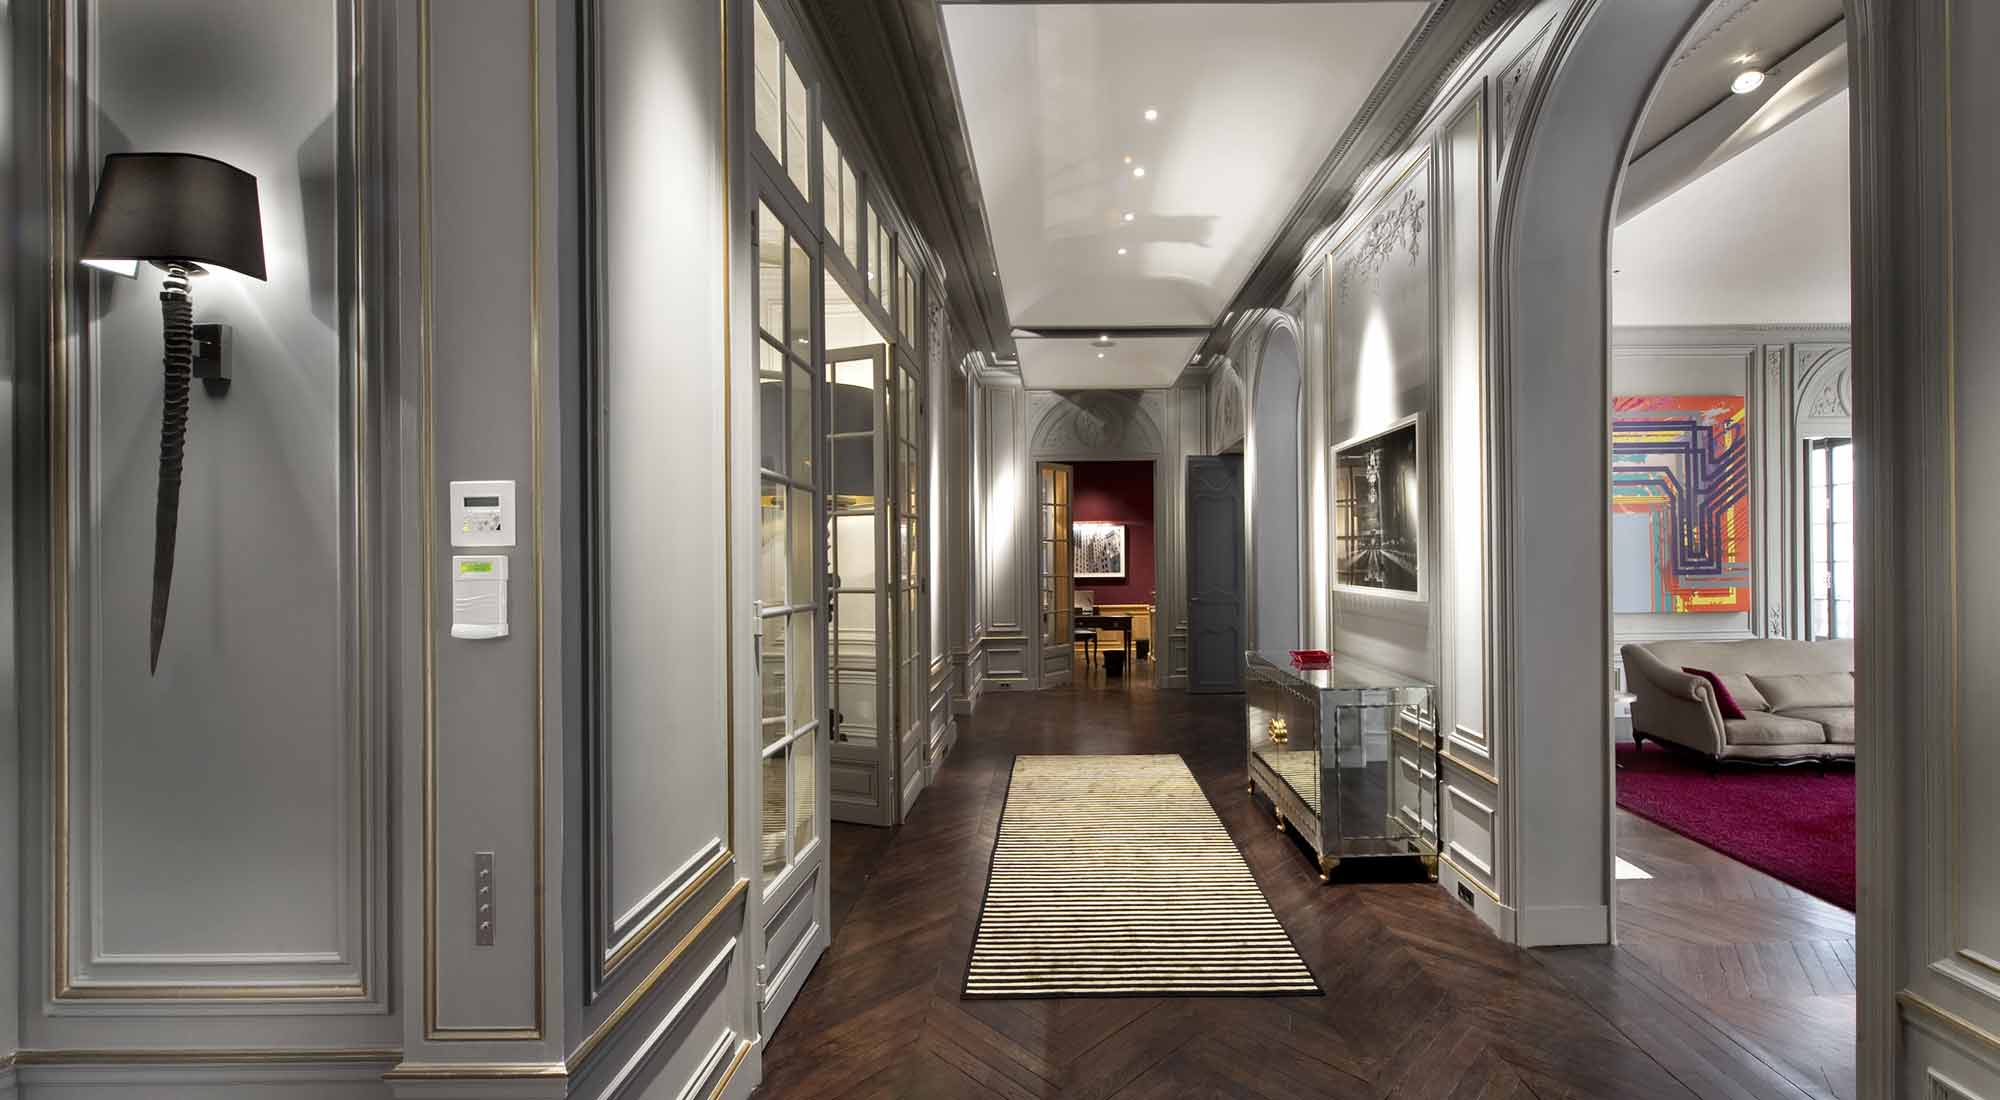 Paris Luxury Apartment for Rent, France